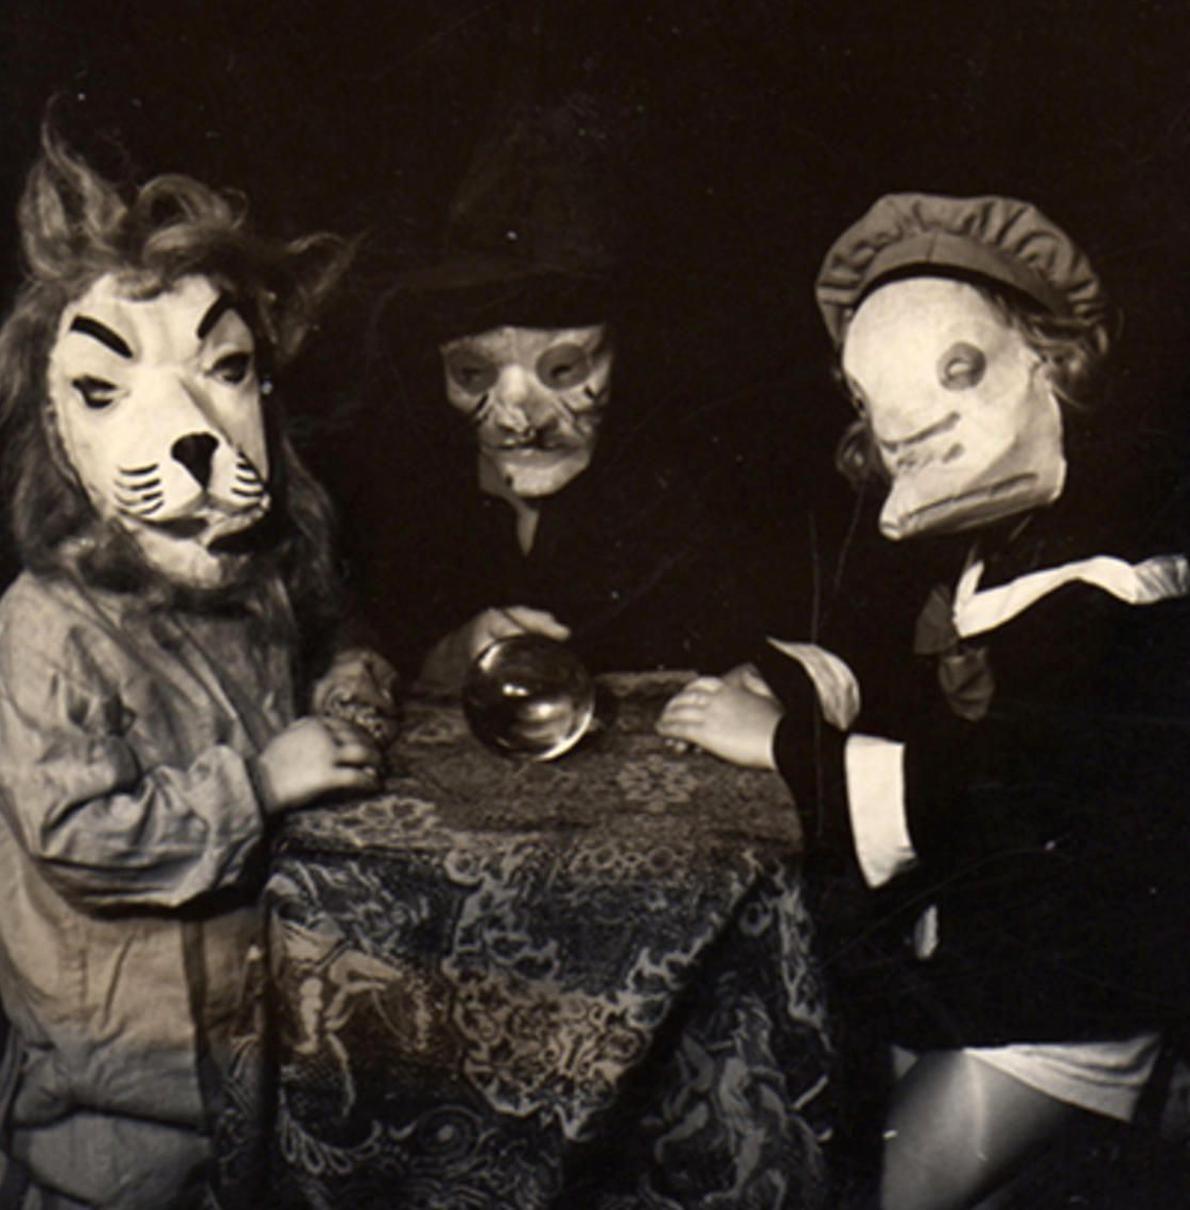 Cbs 2020 Halloween Vintage Halloween   Photo 5   Pictures   CBS News in 2020 | Creepy